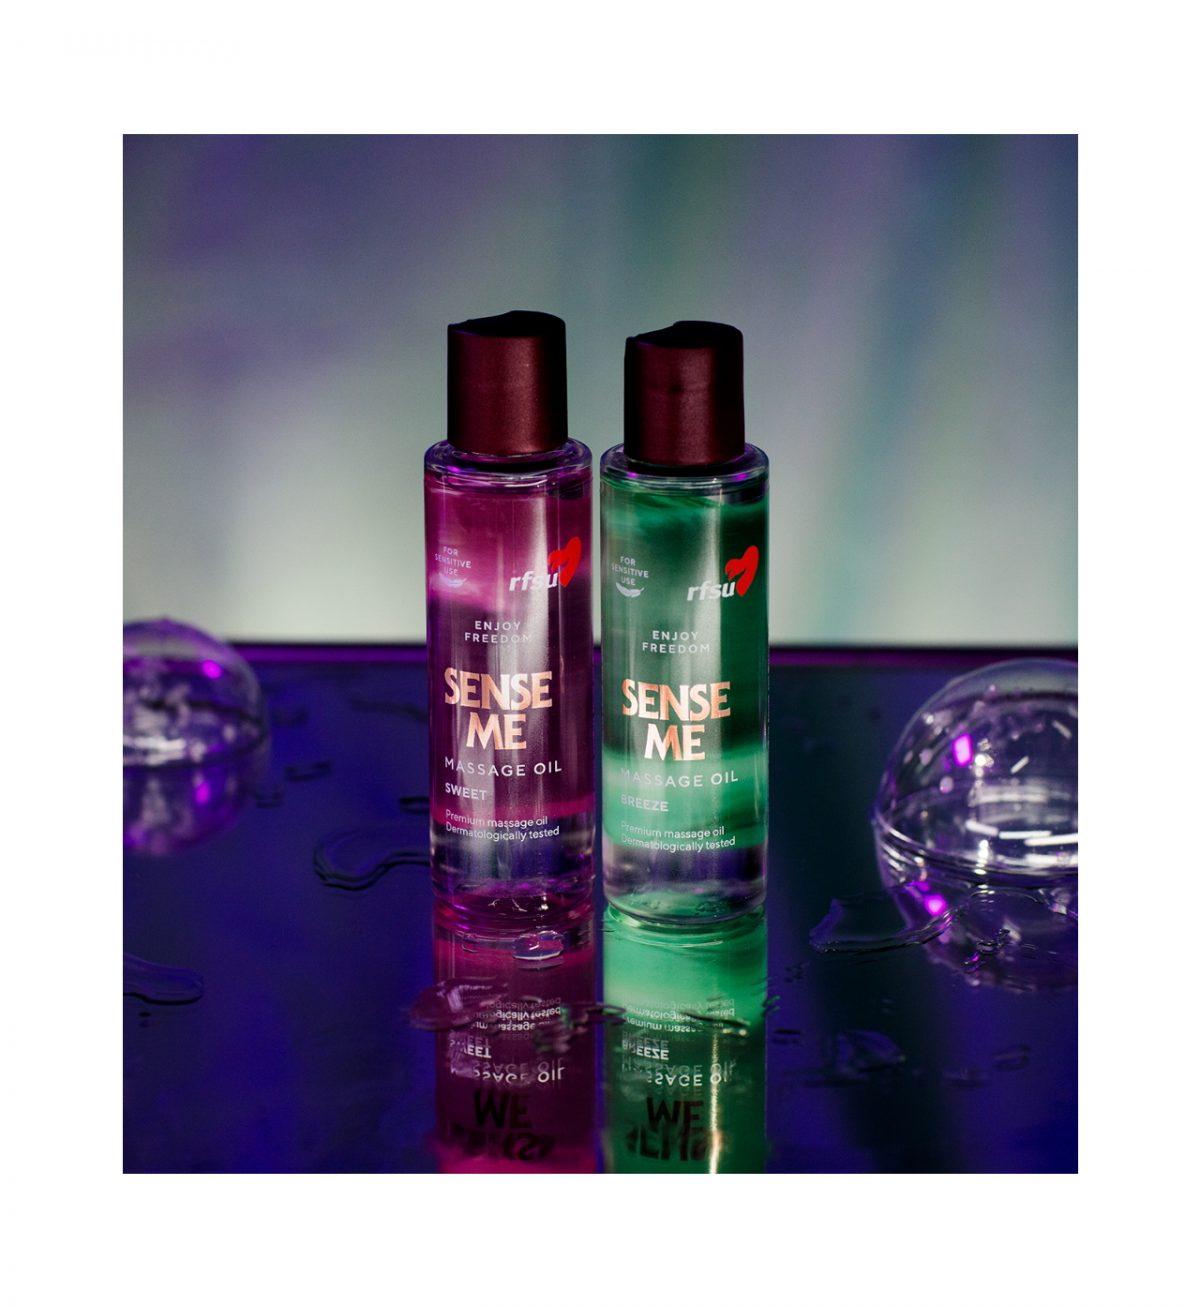 Sense Me Breeze Massage Oil 100ml - Luksuriøs massasjeolje med duft av frisk grapefrukt - RFSU